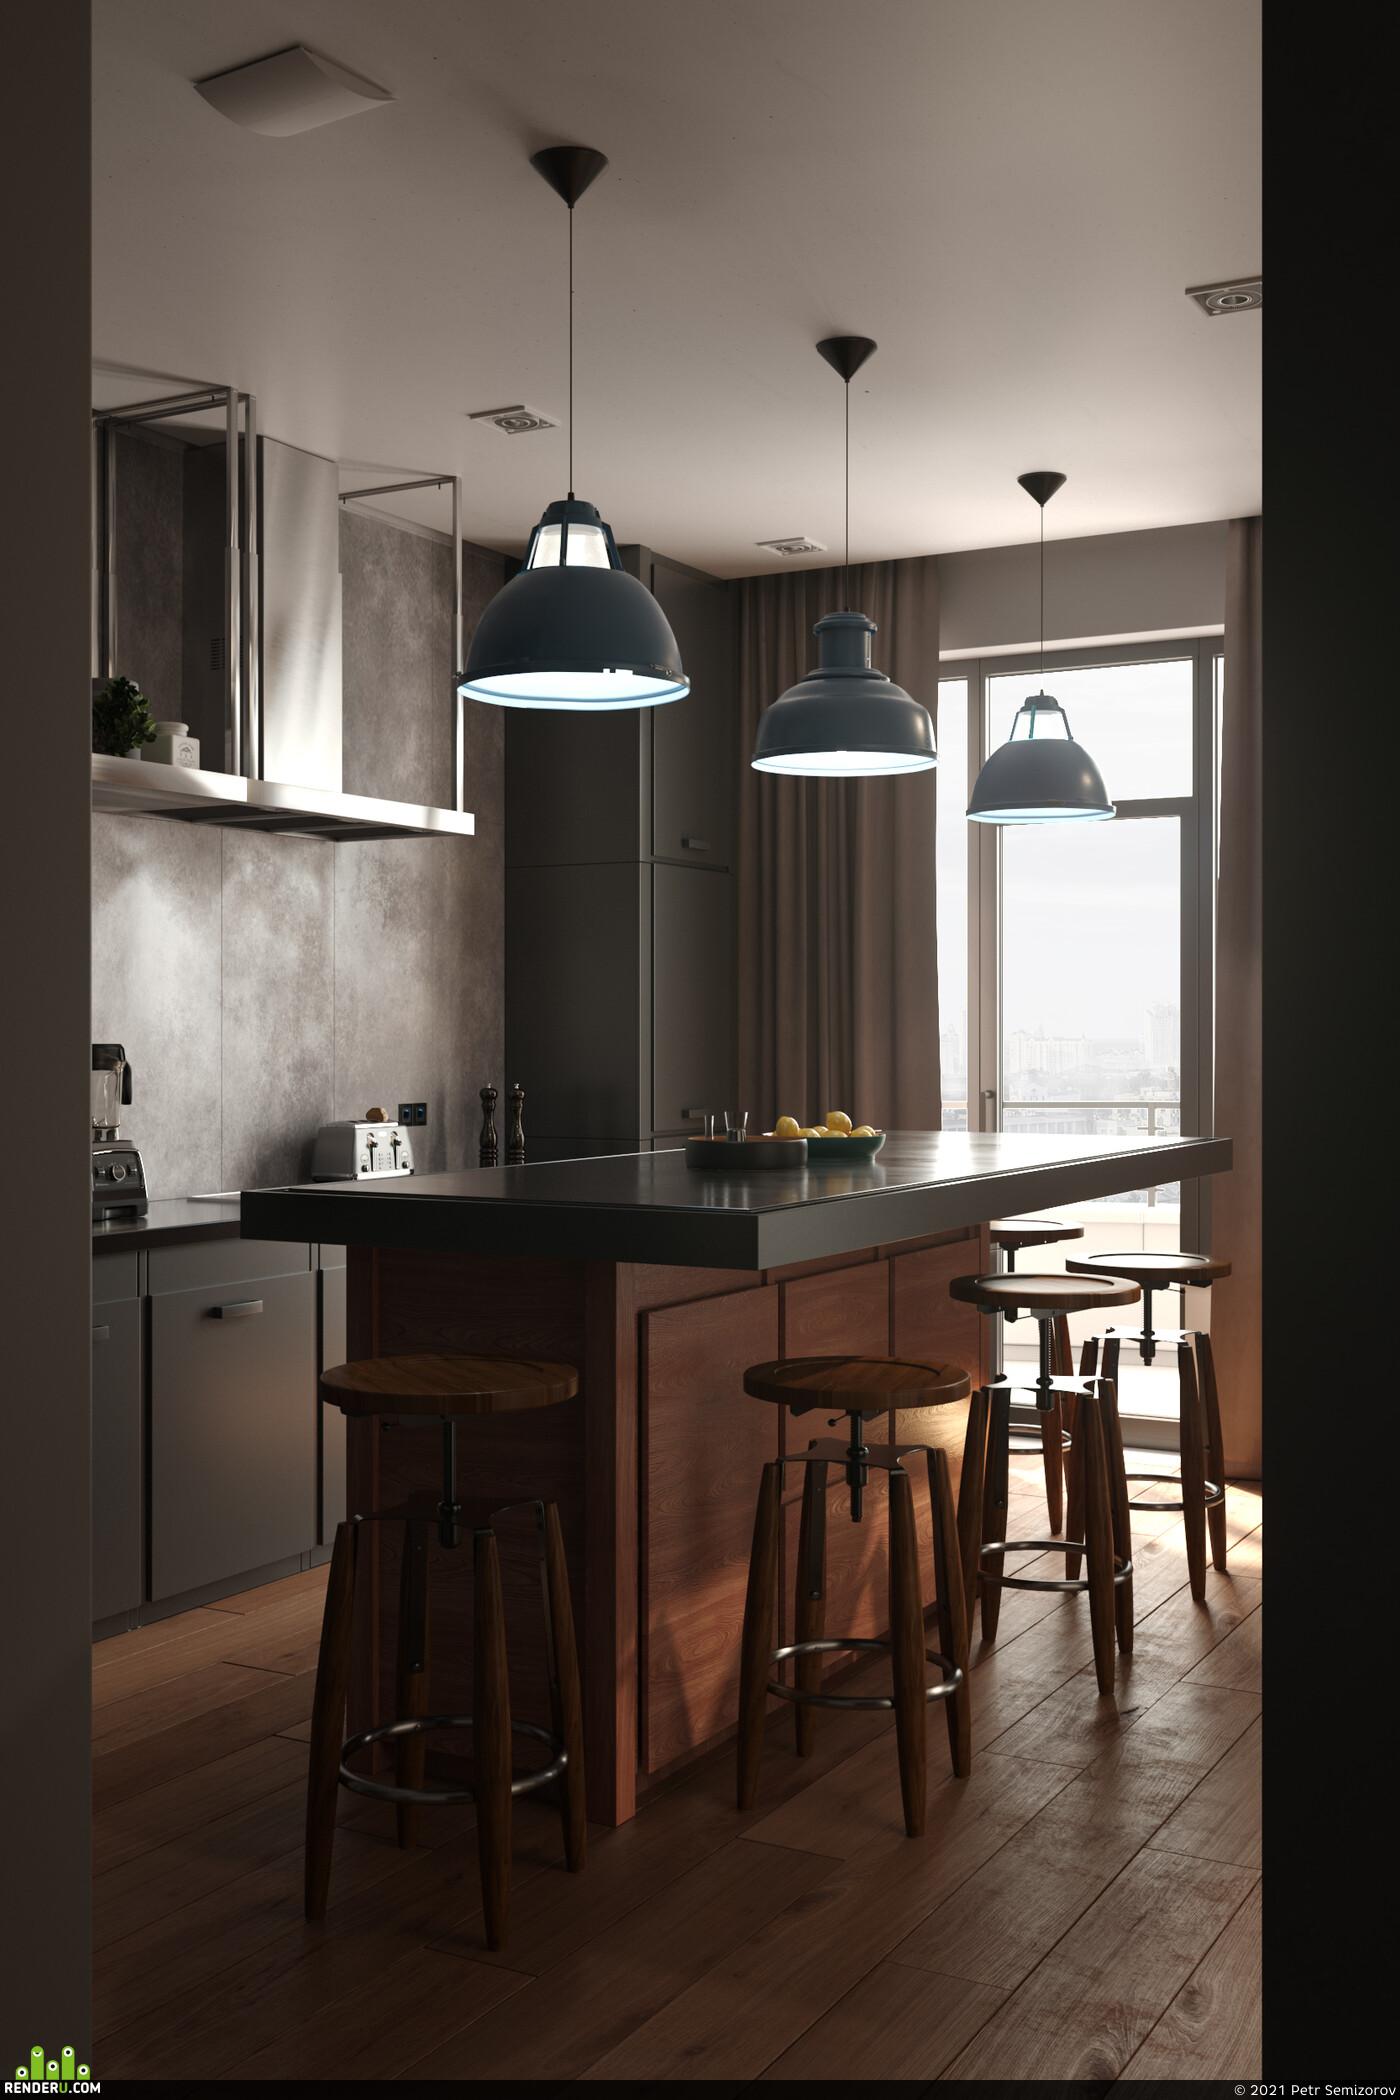 interior, Minimalist Loft, interior loft, 3D архитектура, 3ds Max, coronarender, Photoshop, loftstyle, loftkitchen